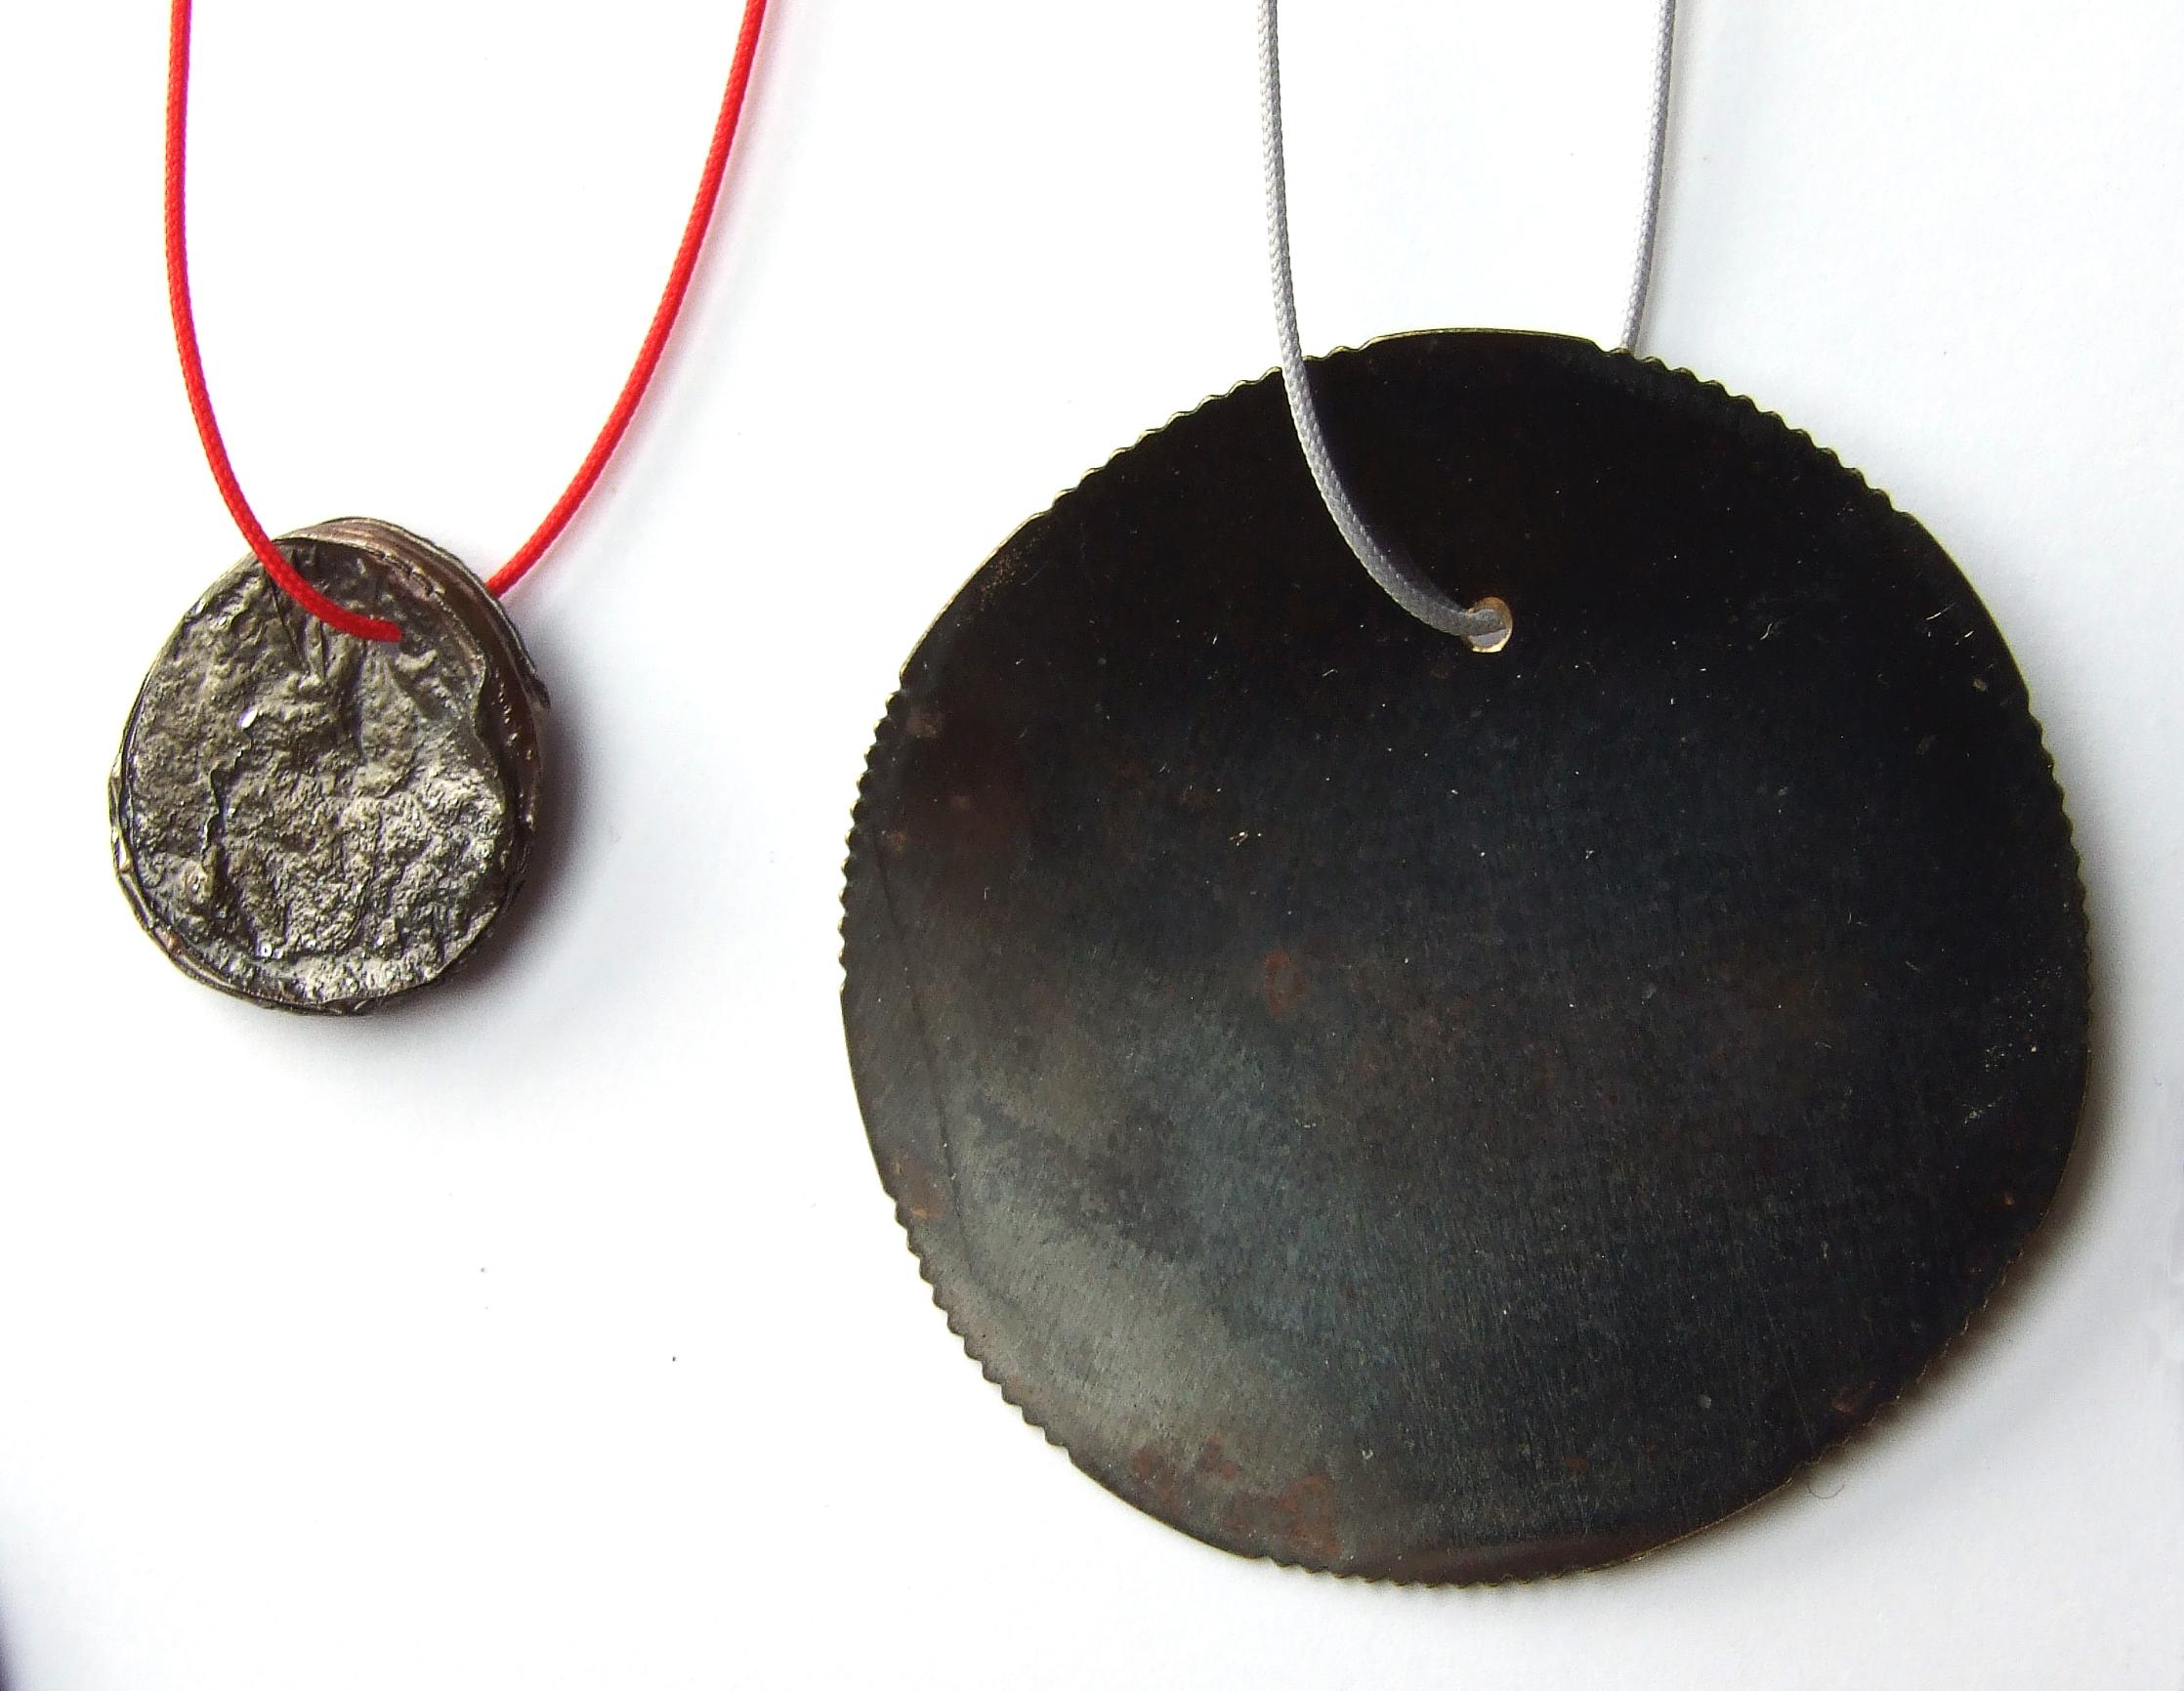 2 Coins closeup